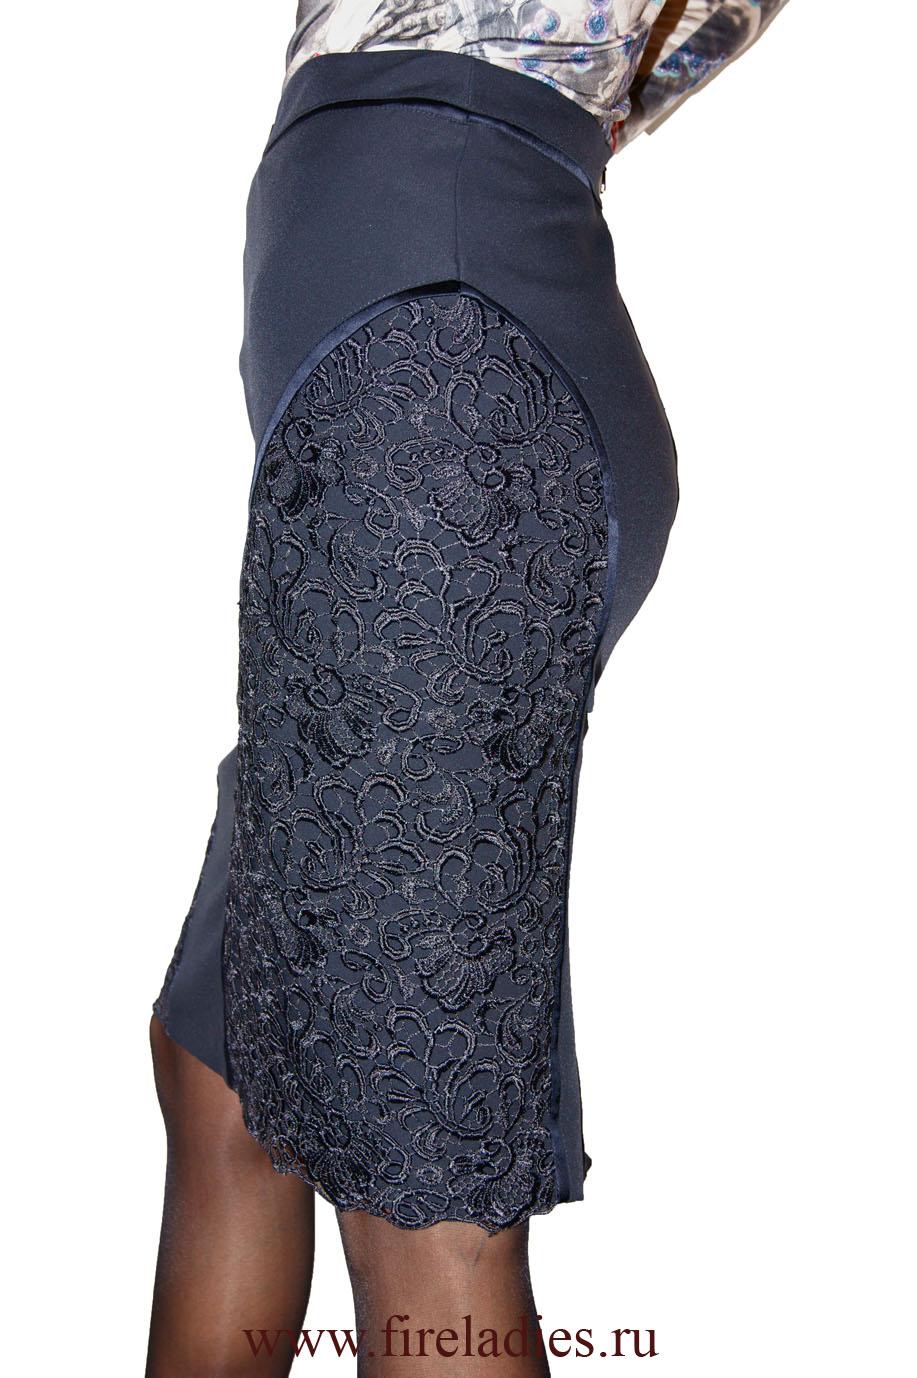 Синяя юбка с доставкой